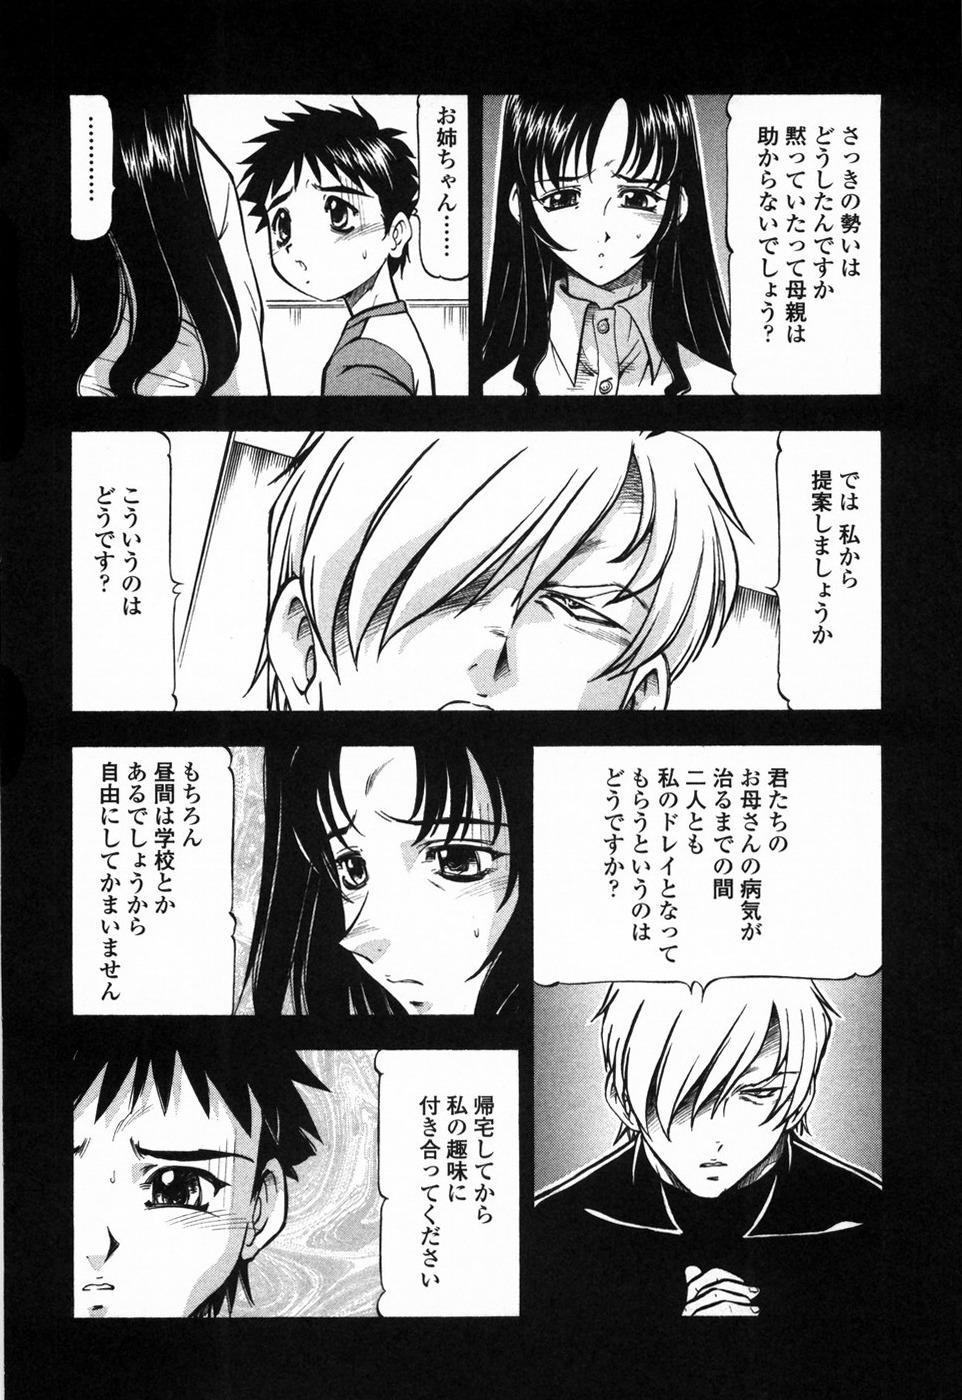 Kichiku Houteishiki - Equation of brutal person 97